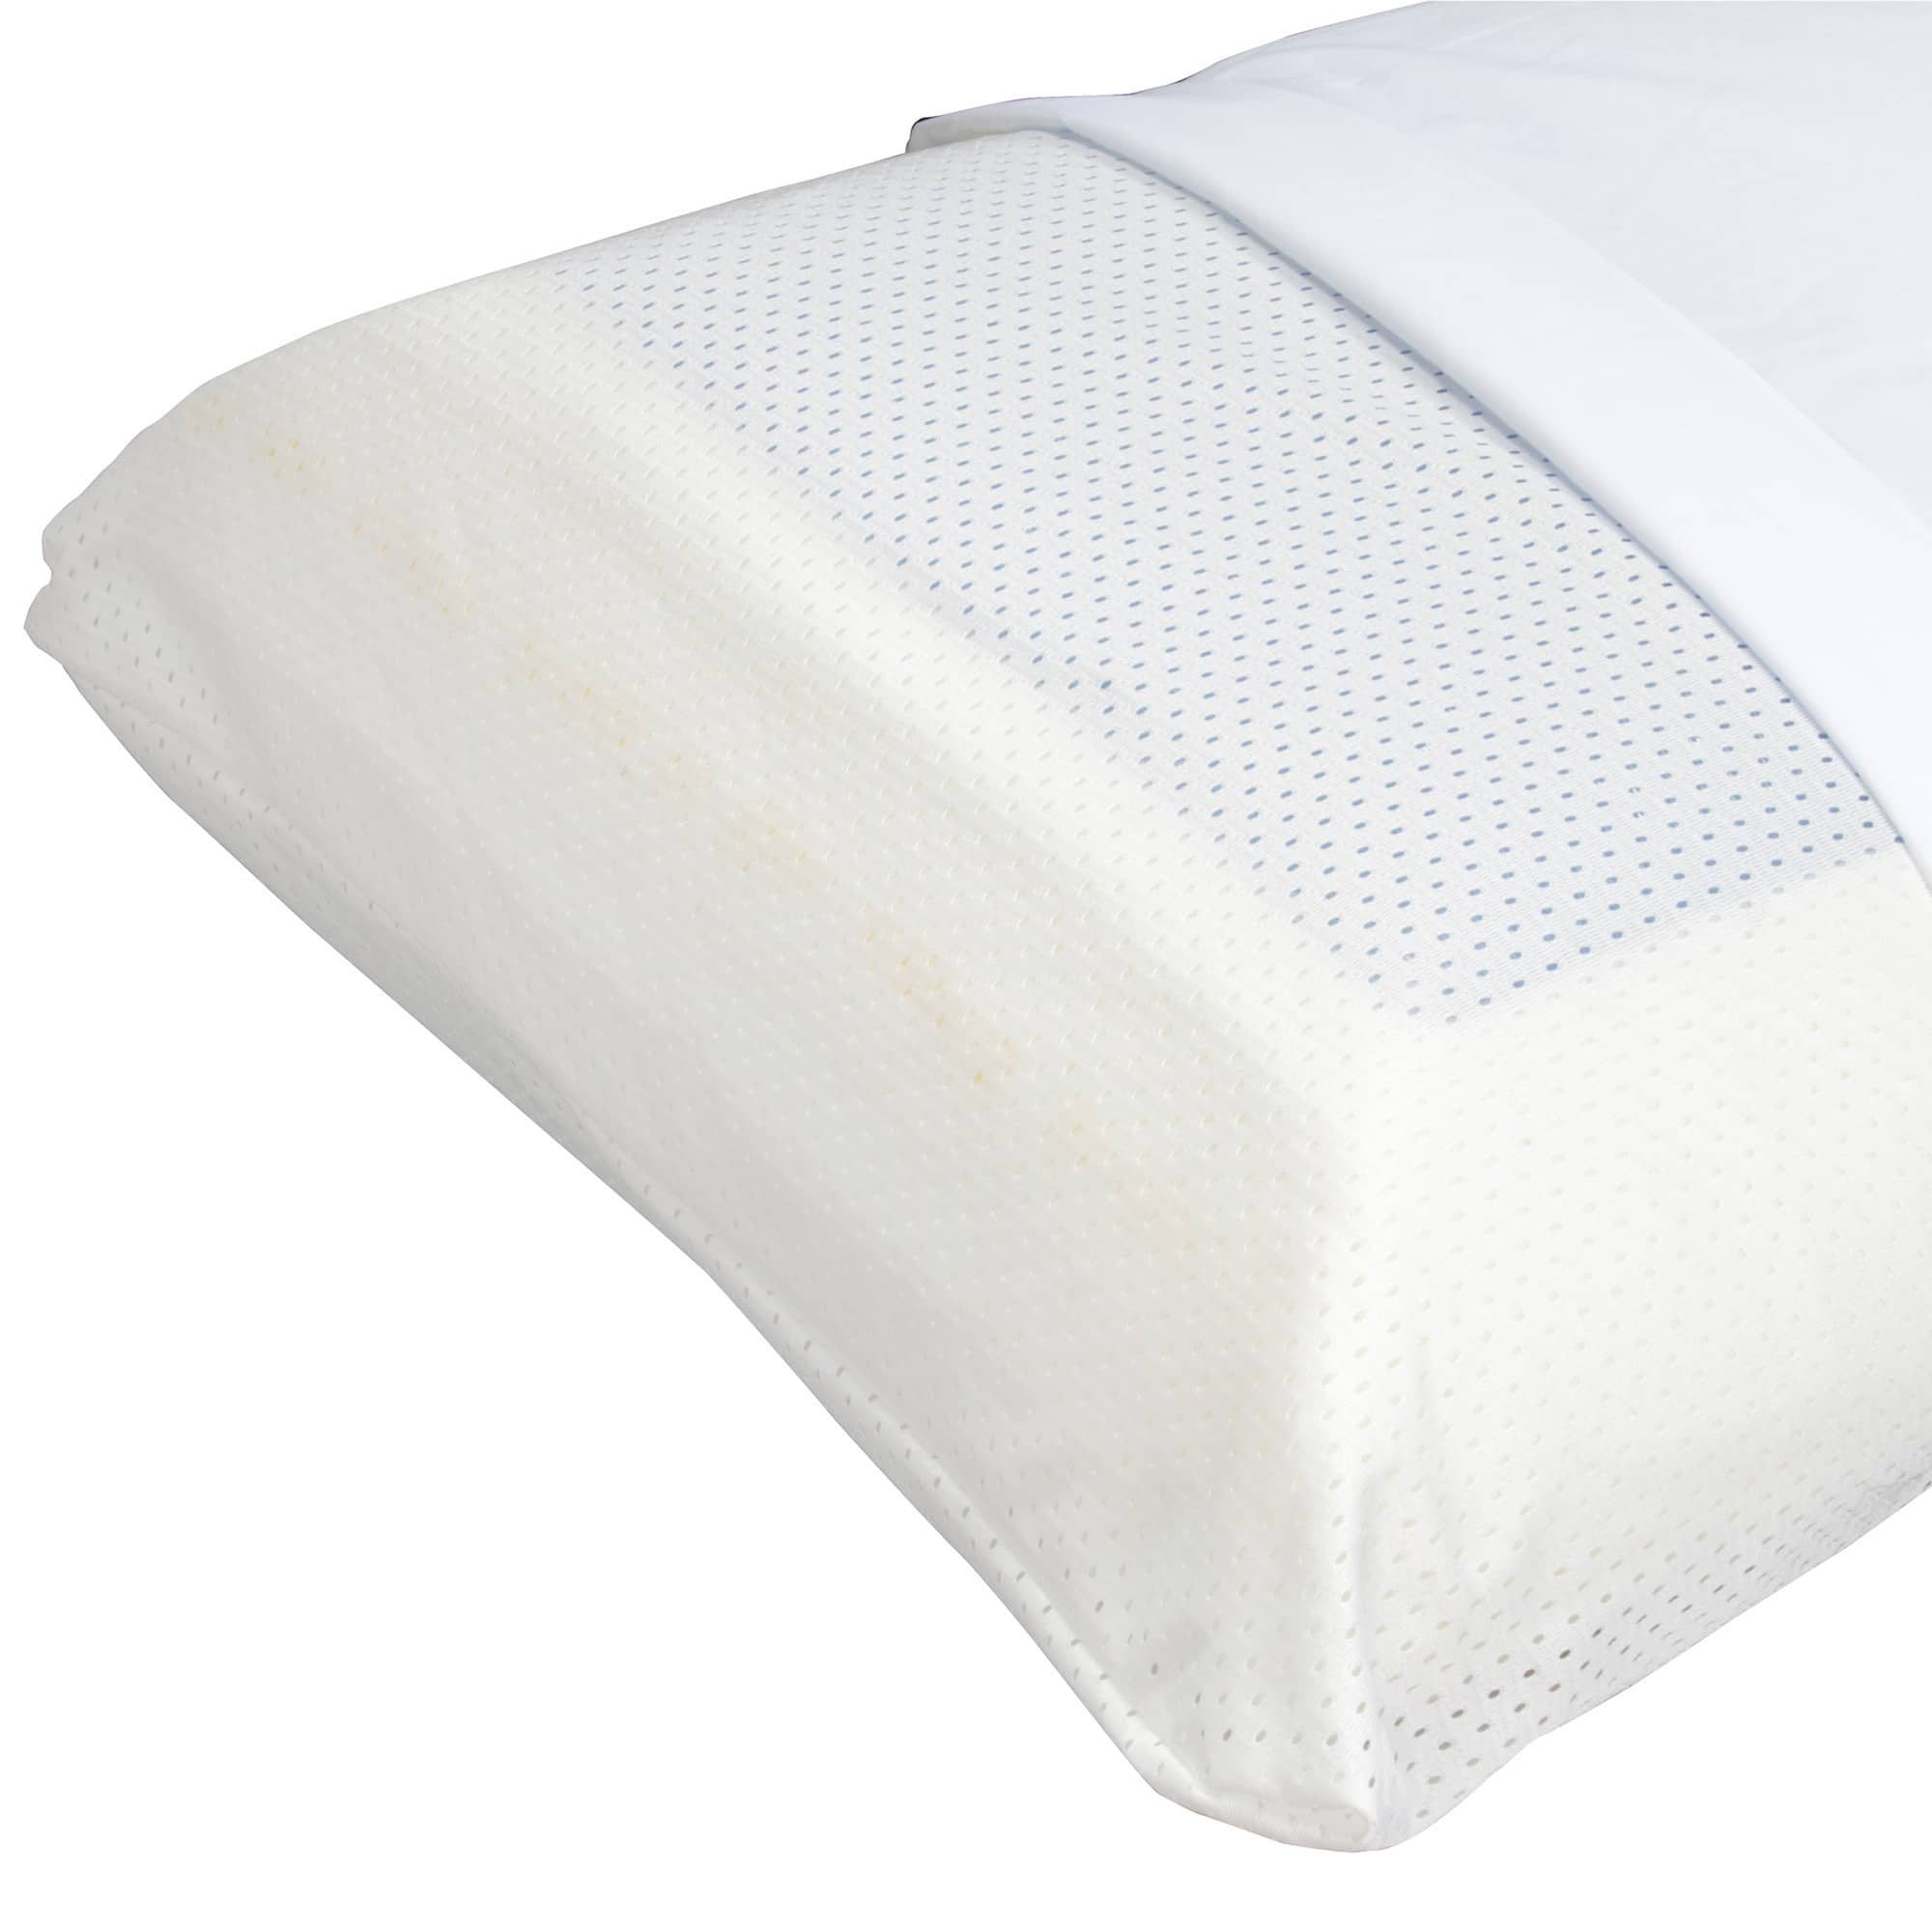 Tempur Traditional Memory Foam Pillow : Memory Foam Pillows For Less Overstock.com